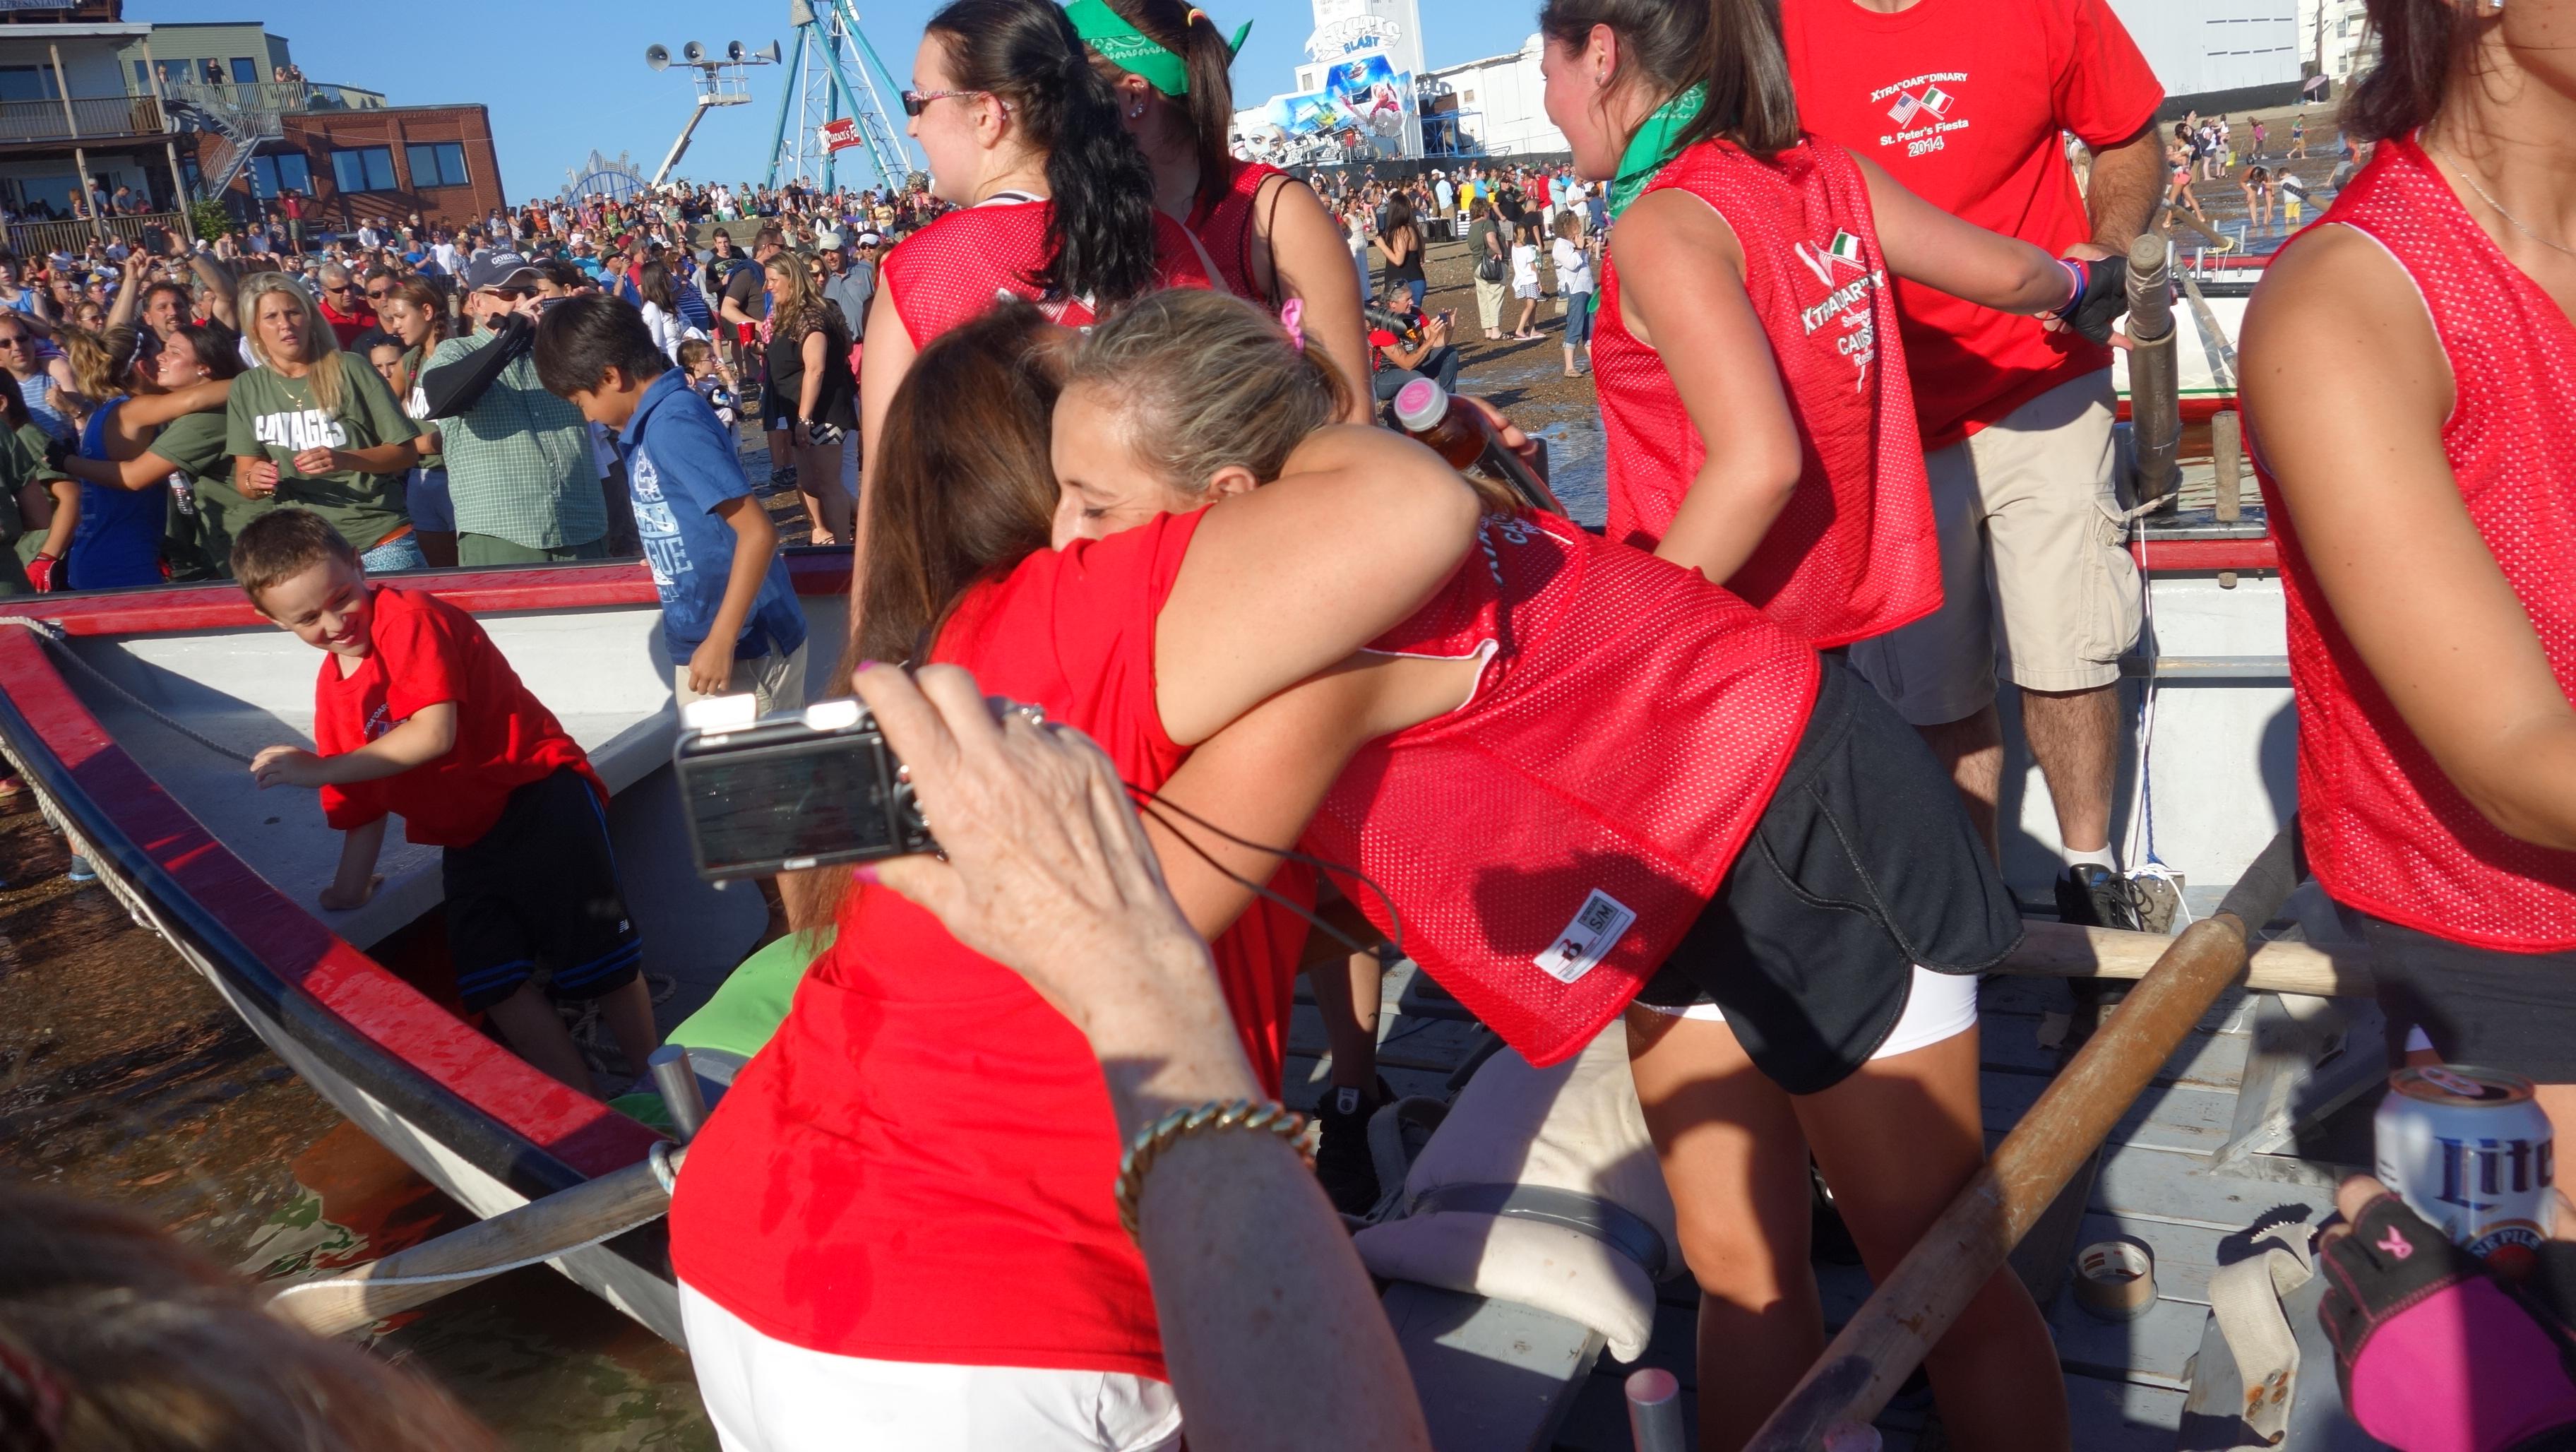 Amanda Race St. Peter's Fiesta 2014 Camps! 217